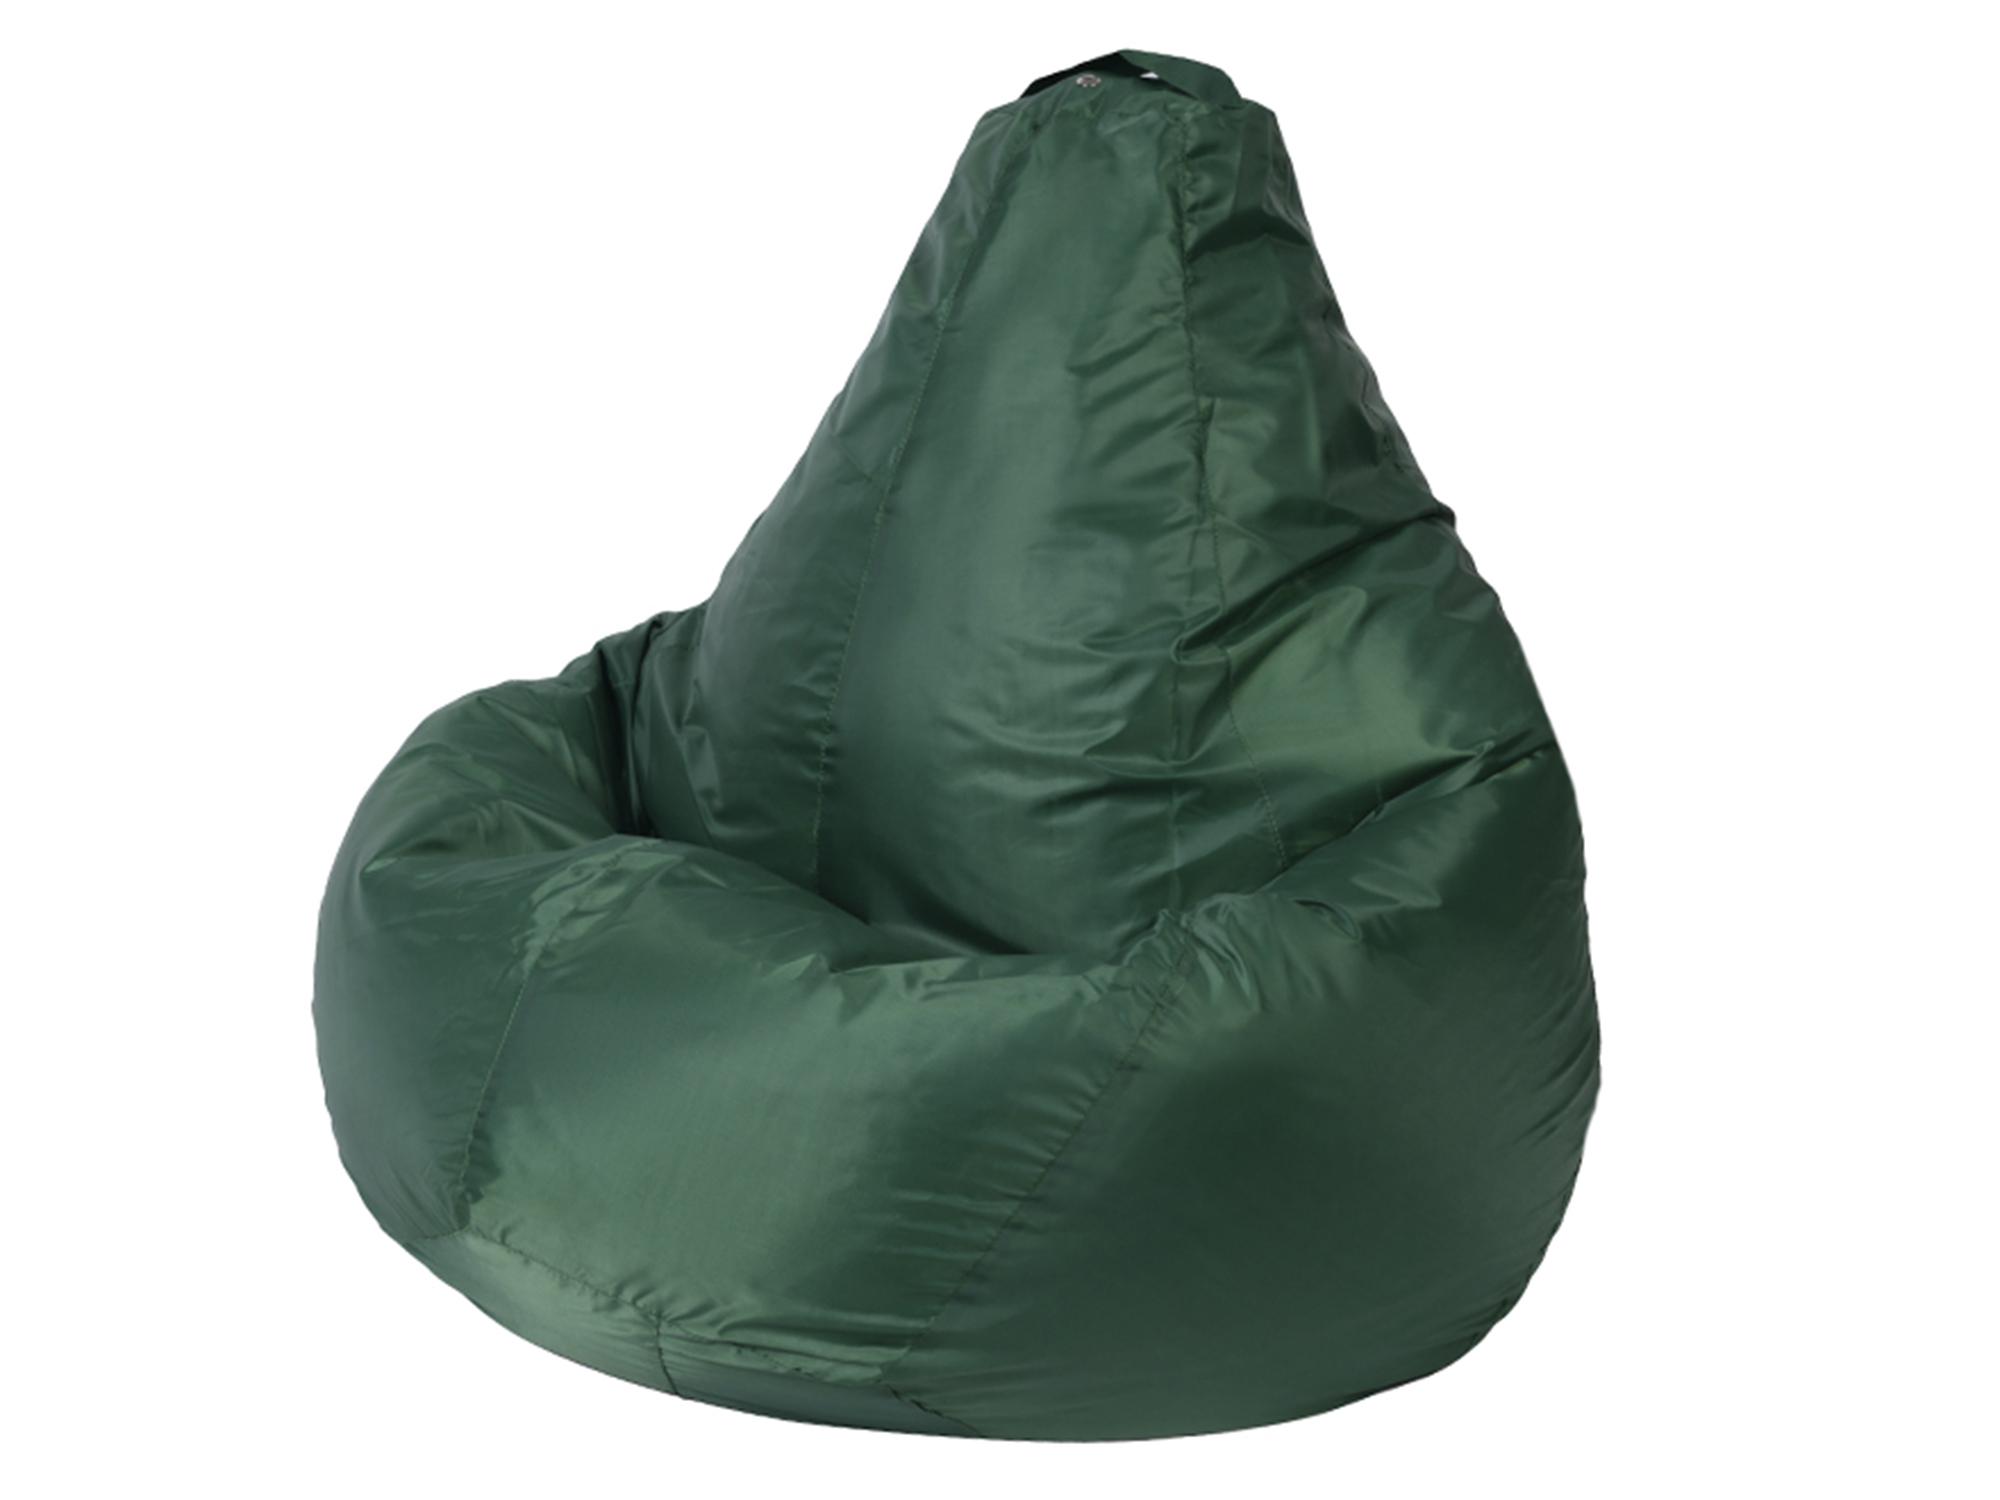 Кресло Мешок Зеленое Оксфорд XL 125х85 MebelVia , Зеленый, Оксфорд кресло мешок флаги xl 125х85 mebelvia